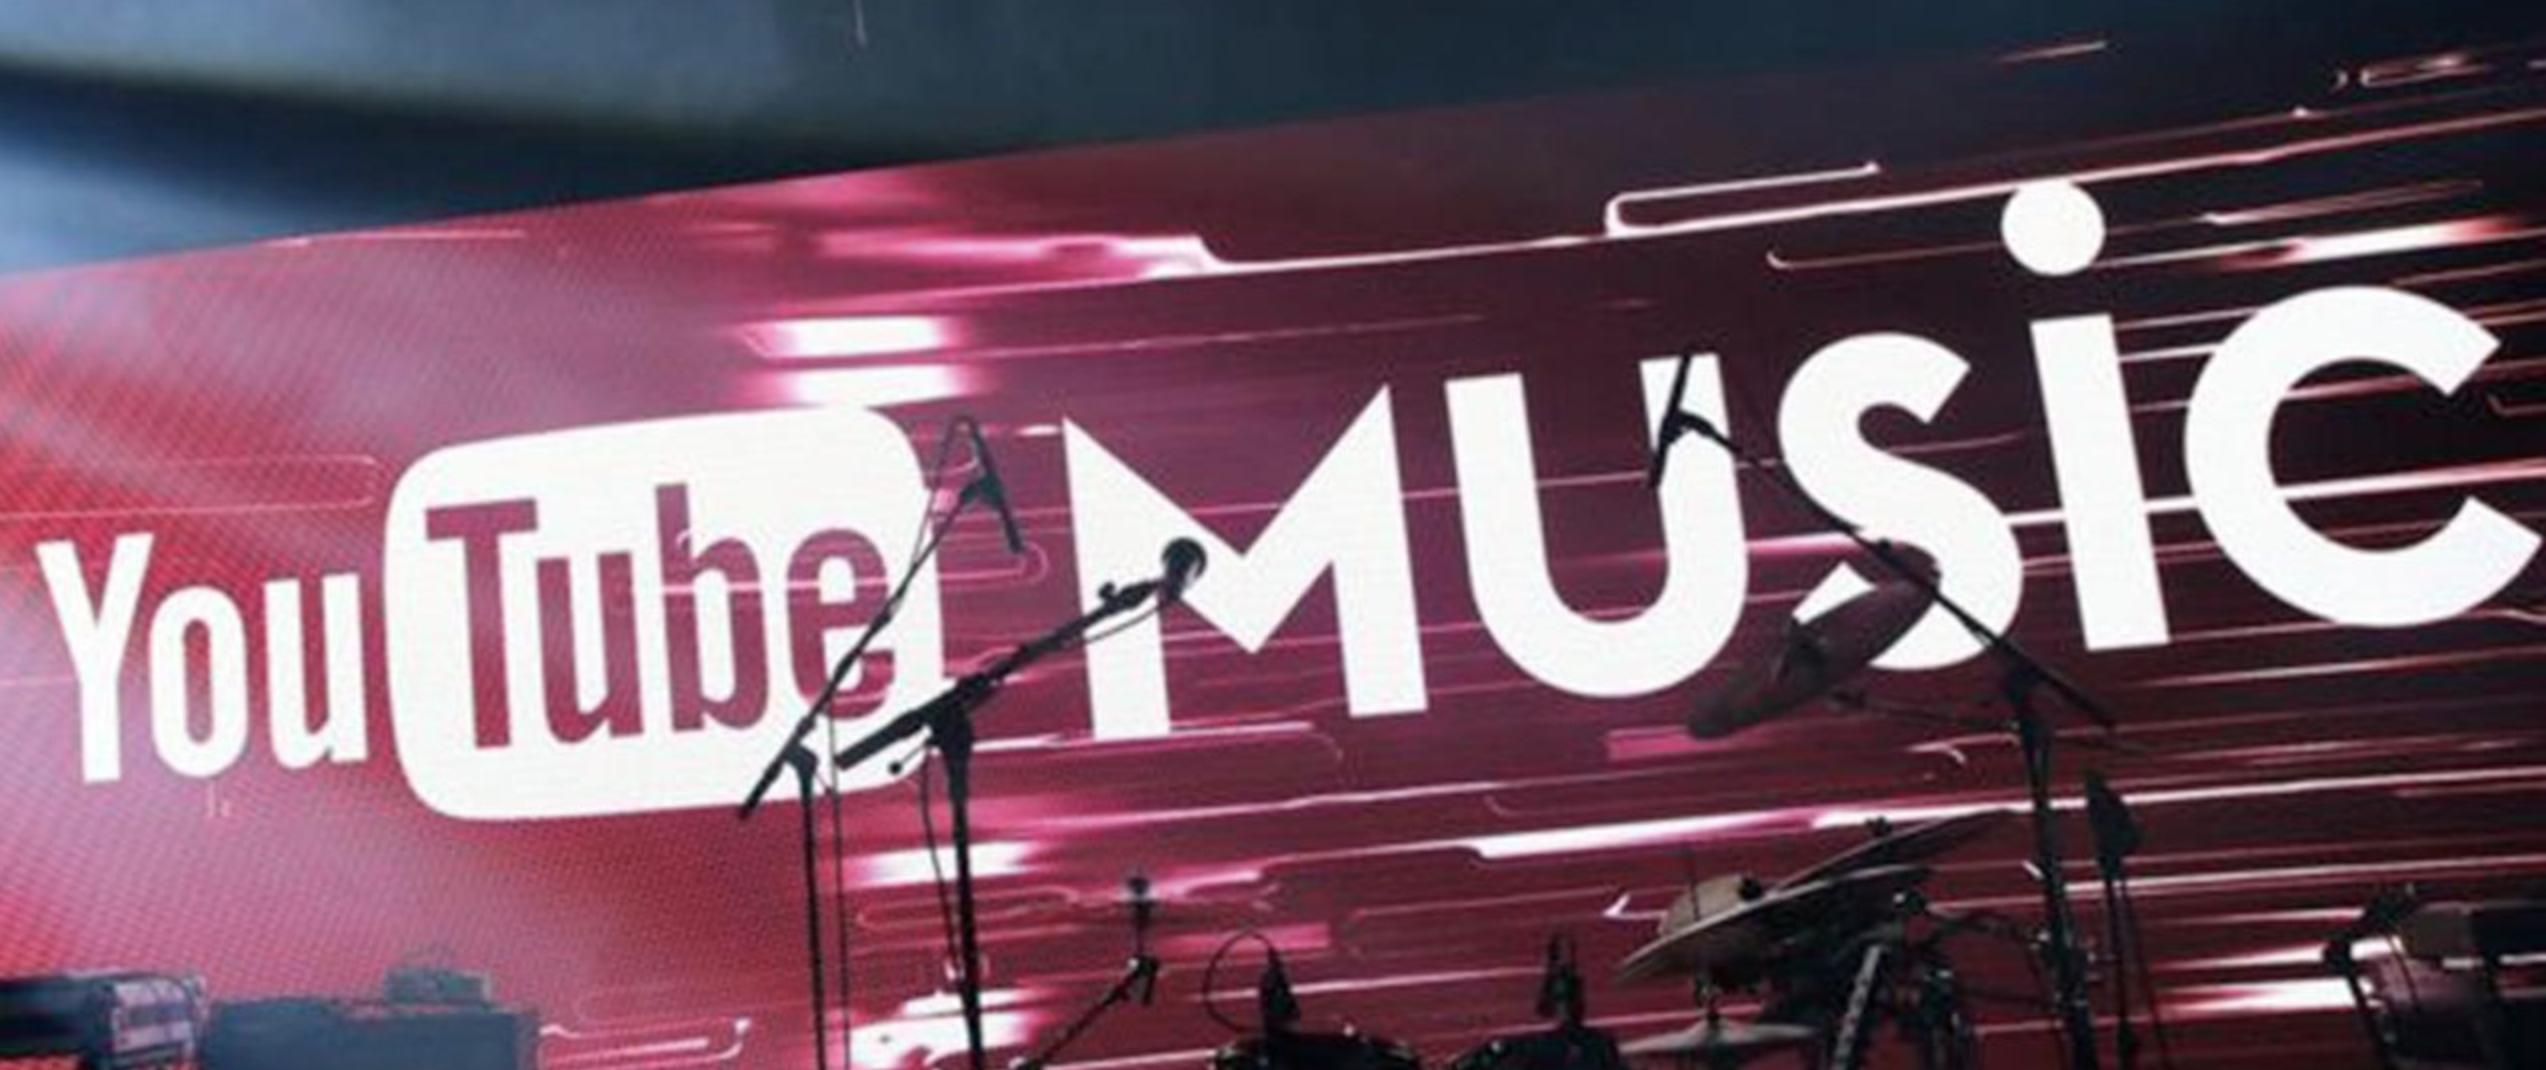 YouTube Music и YouTube Premium (Red) - интеграция с Google